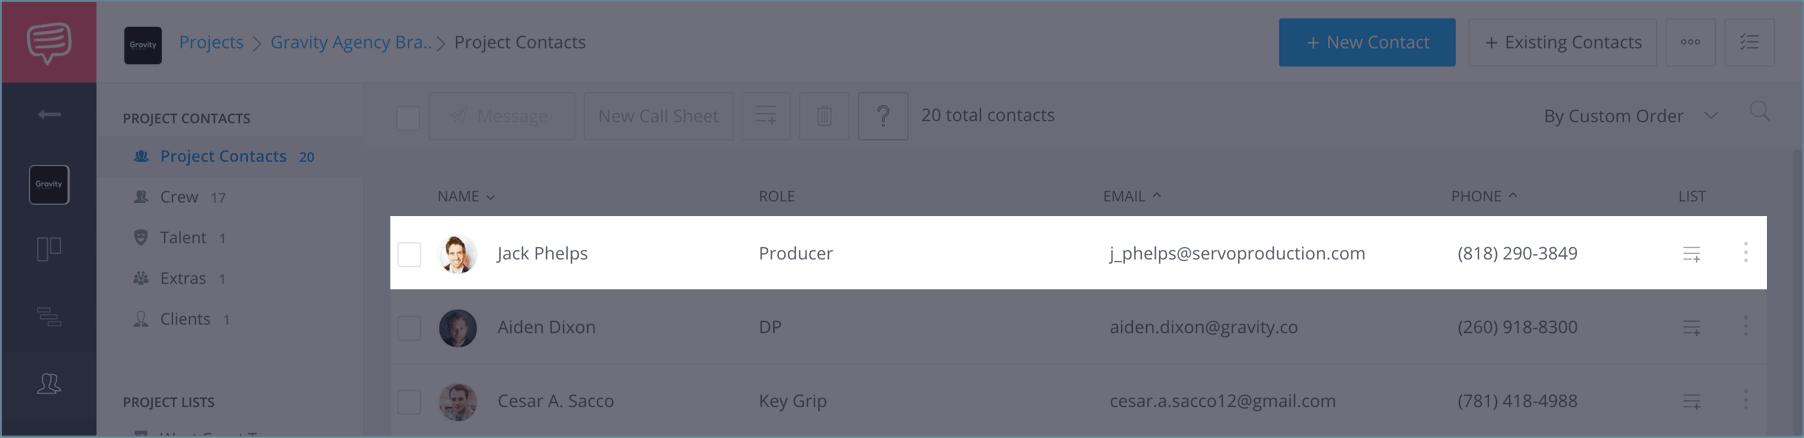 Create a FREE Film Film Production Crew Contact Sheet - StudioBinder - 15b